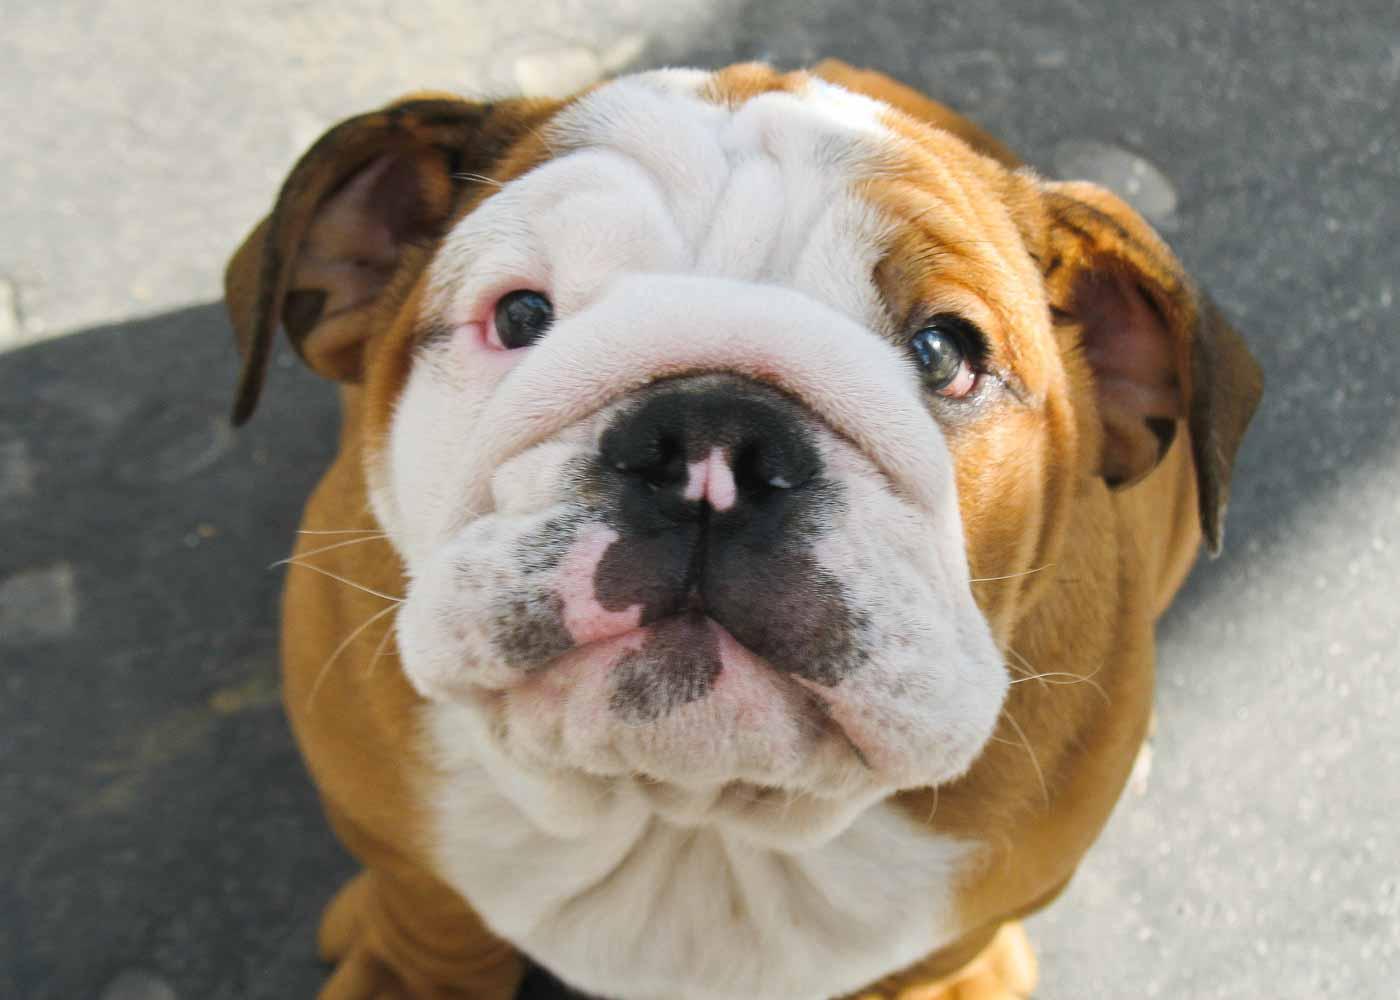 A bulldog puppy.